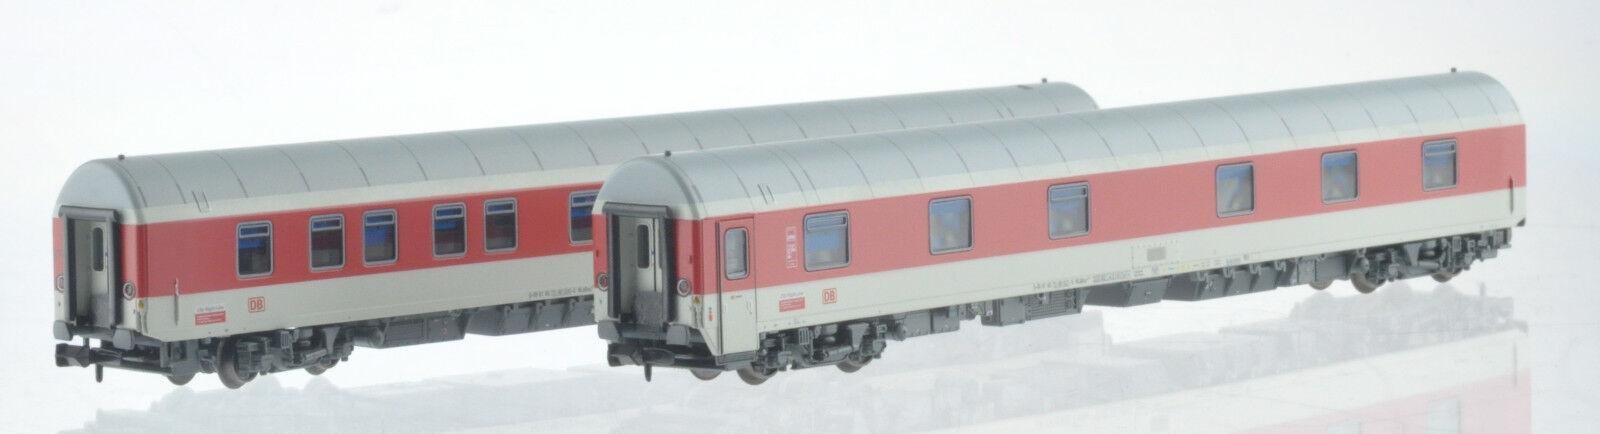 LS Models Esplendidos 96910 DB AG CNL 2x Sleeping Car DB Red White Ep6 NEW + OVP